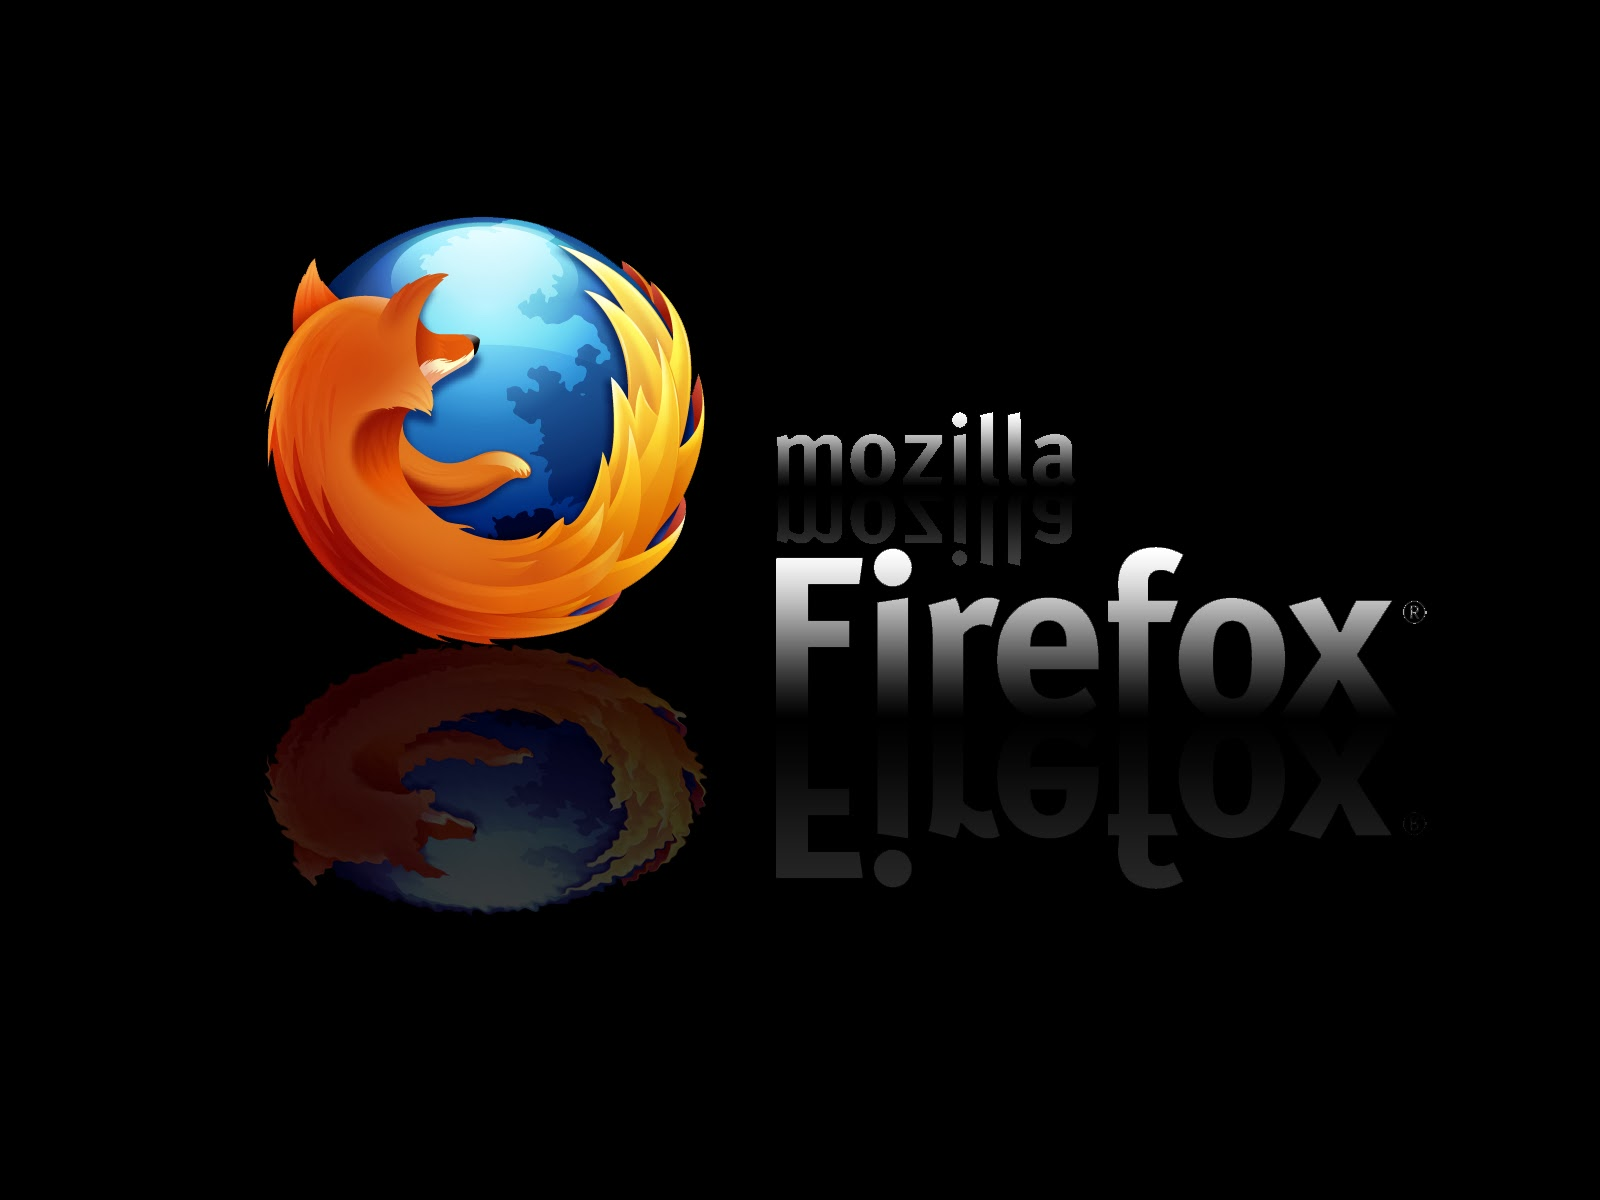 Download Mozilla Firefox Terbaru v27.0.1